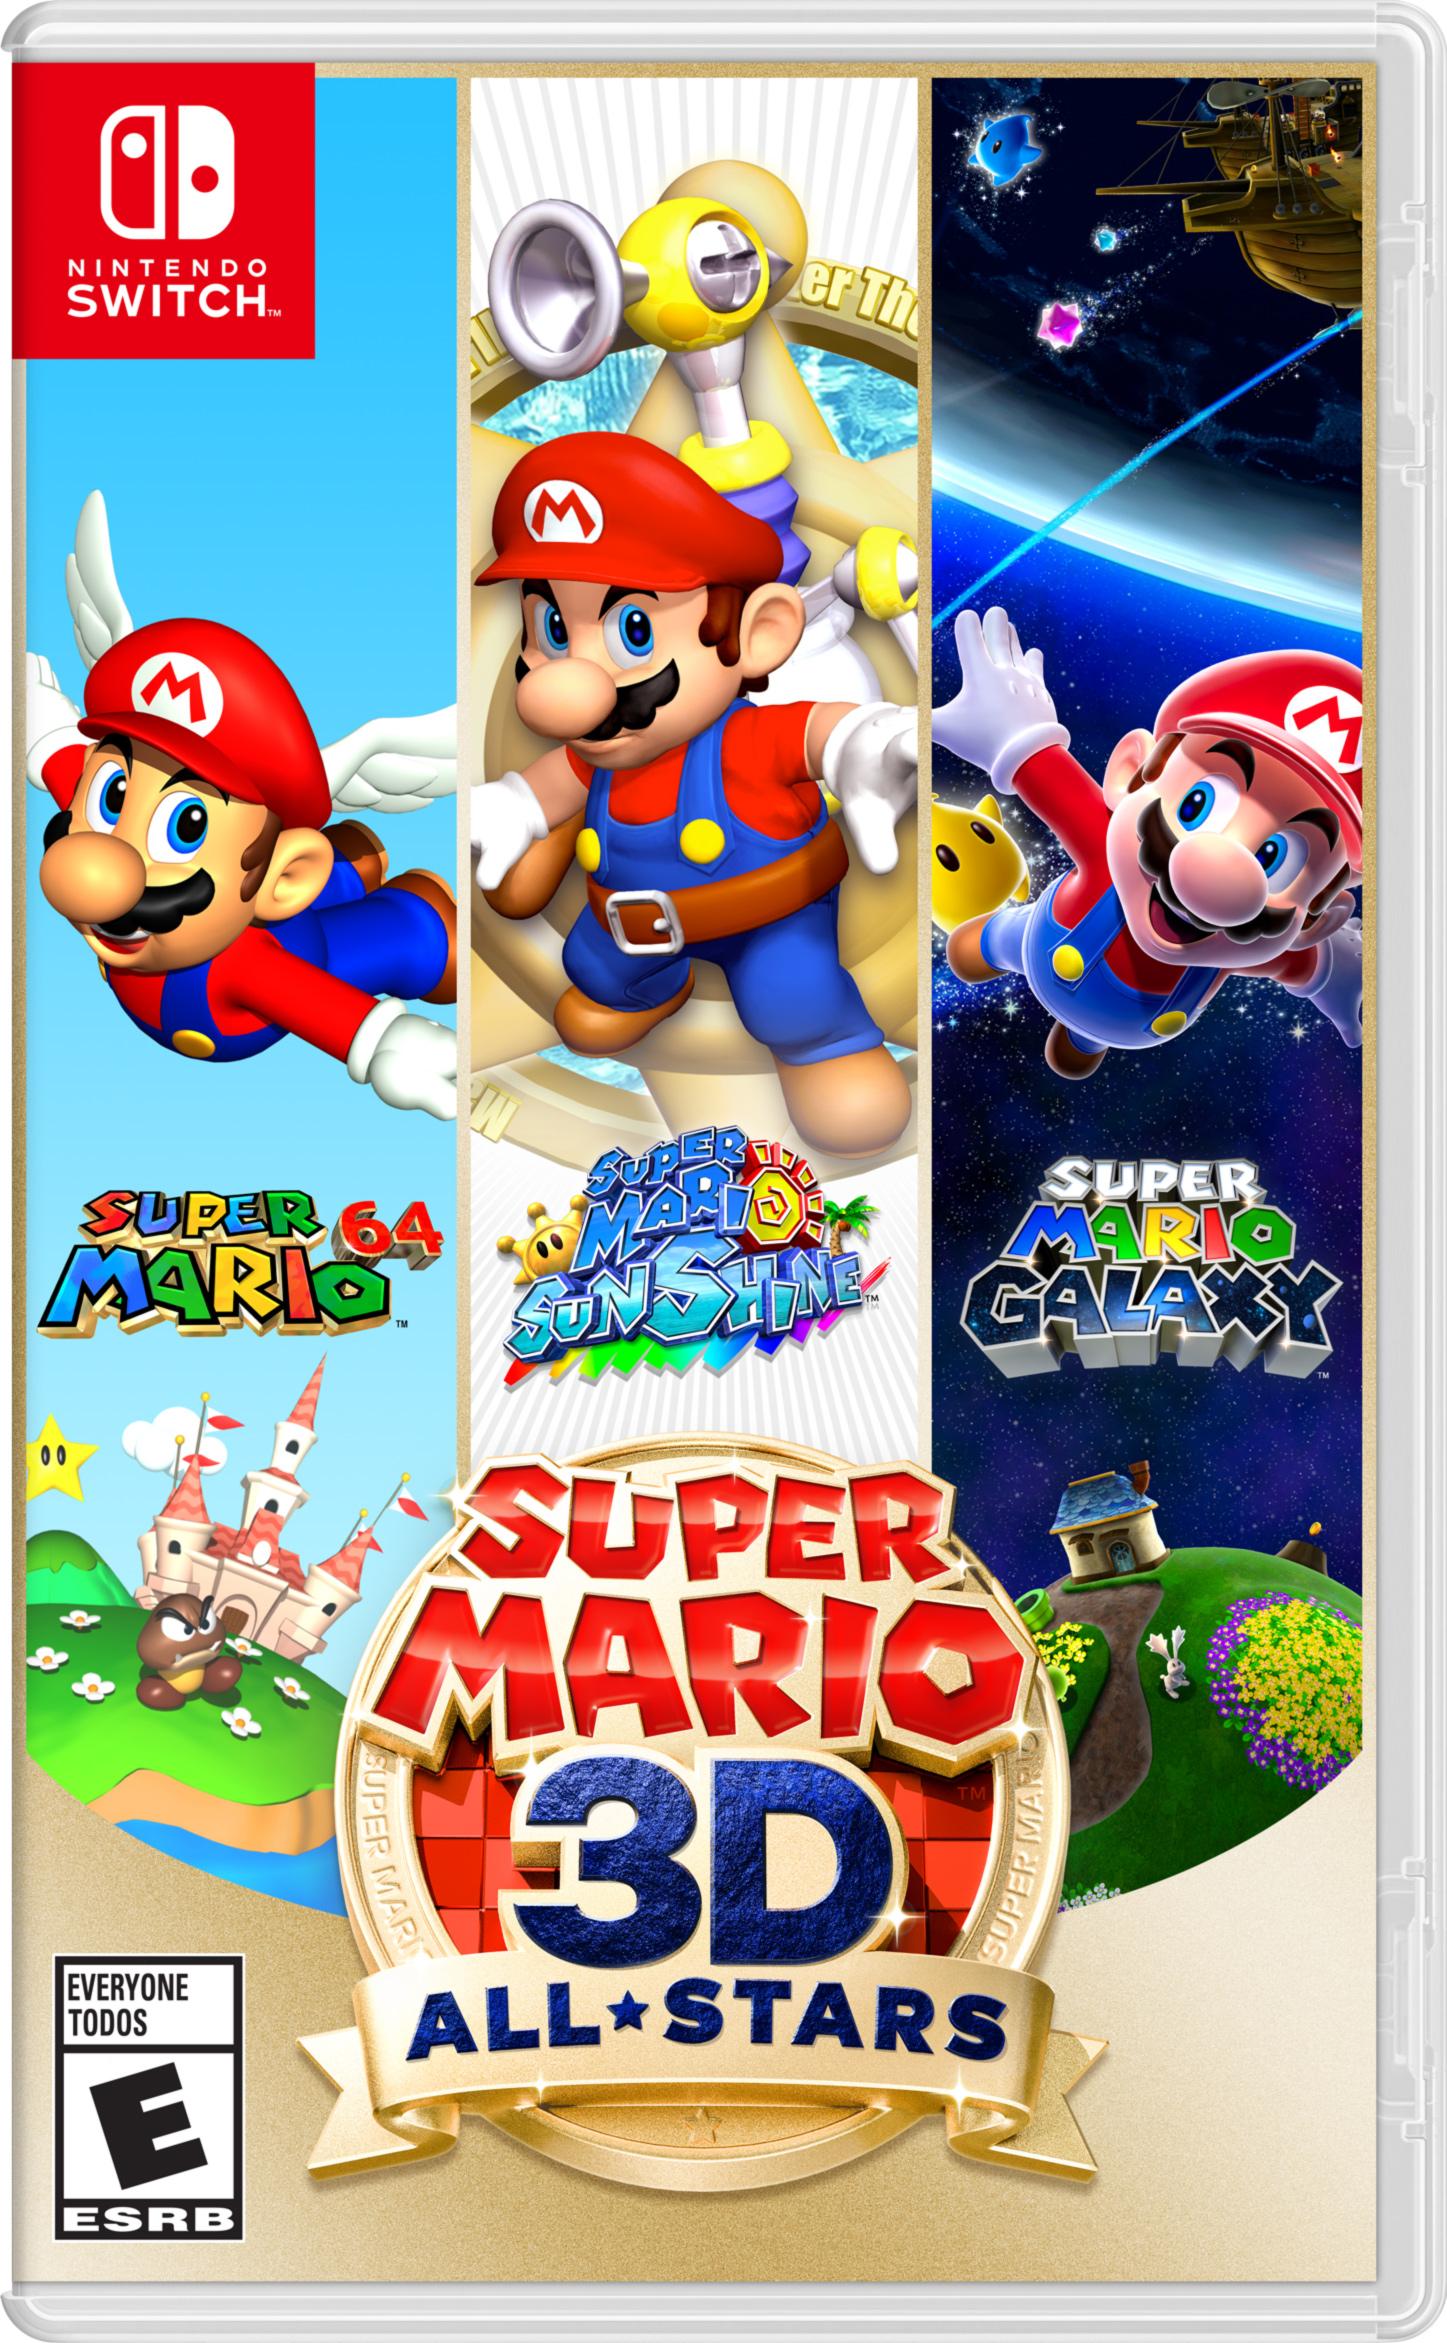 $49.94 Super Mario 3D All-Stars - IN STORE YMMV (Sept 18 / Nintendo Switch) - Walmart